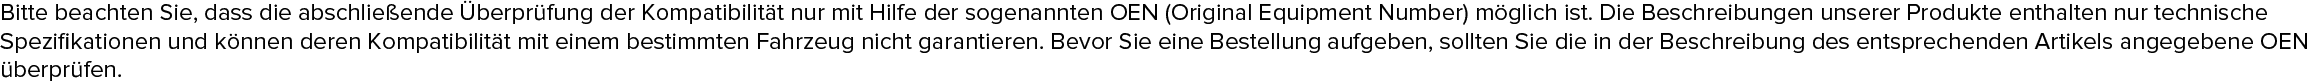 MONROE 0013232700 Stoßdämpfer